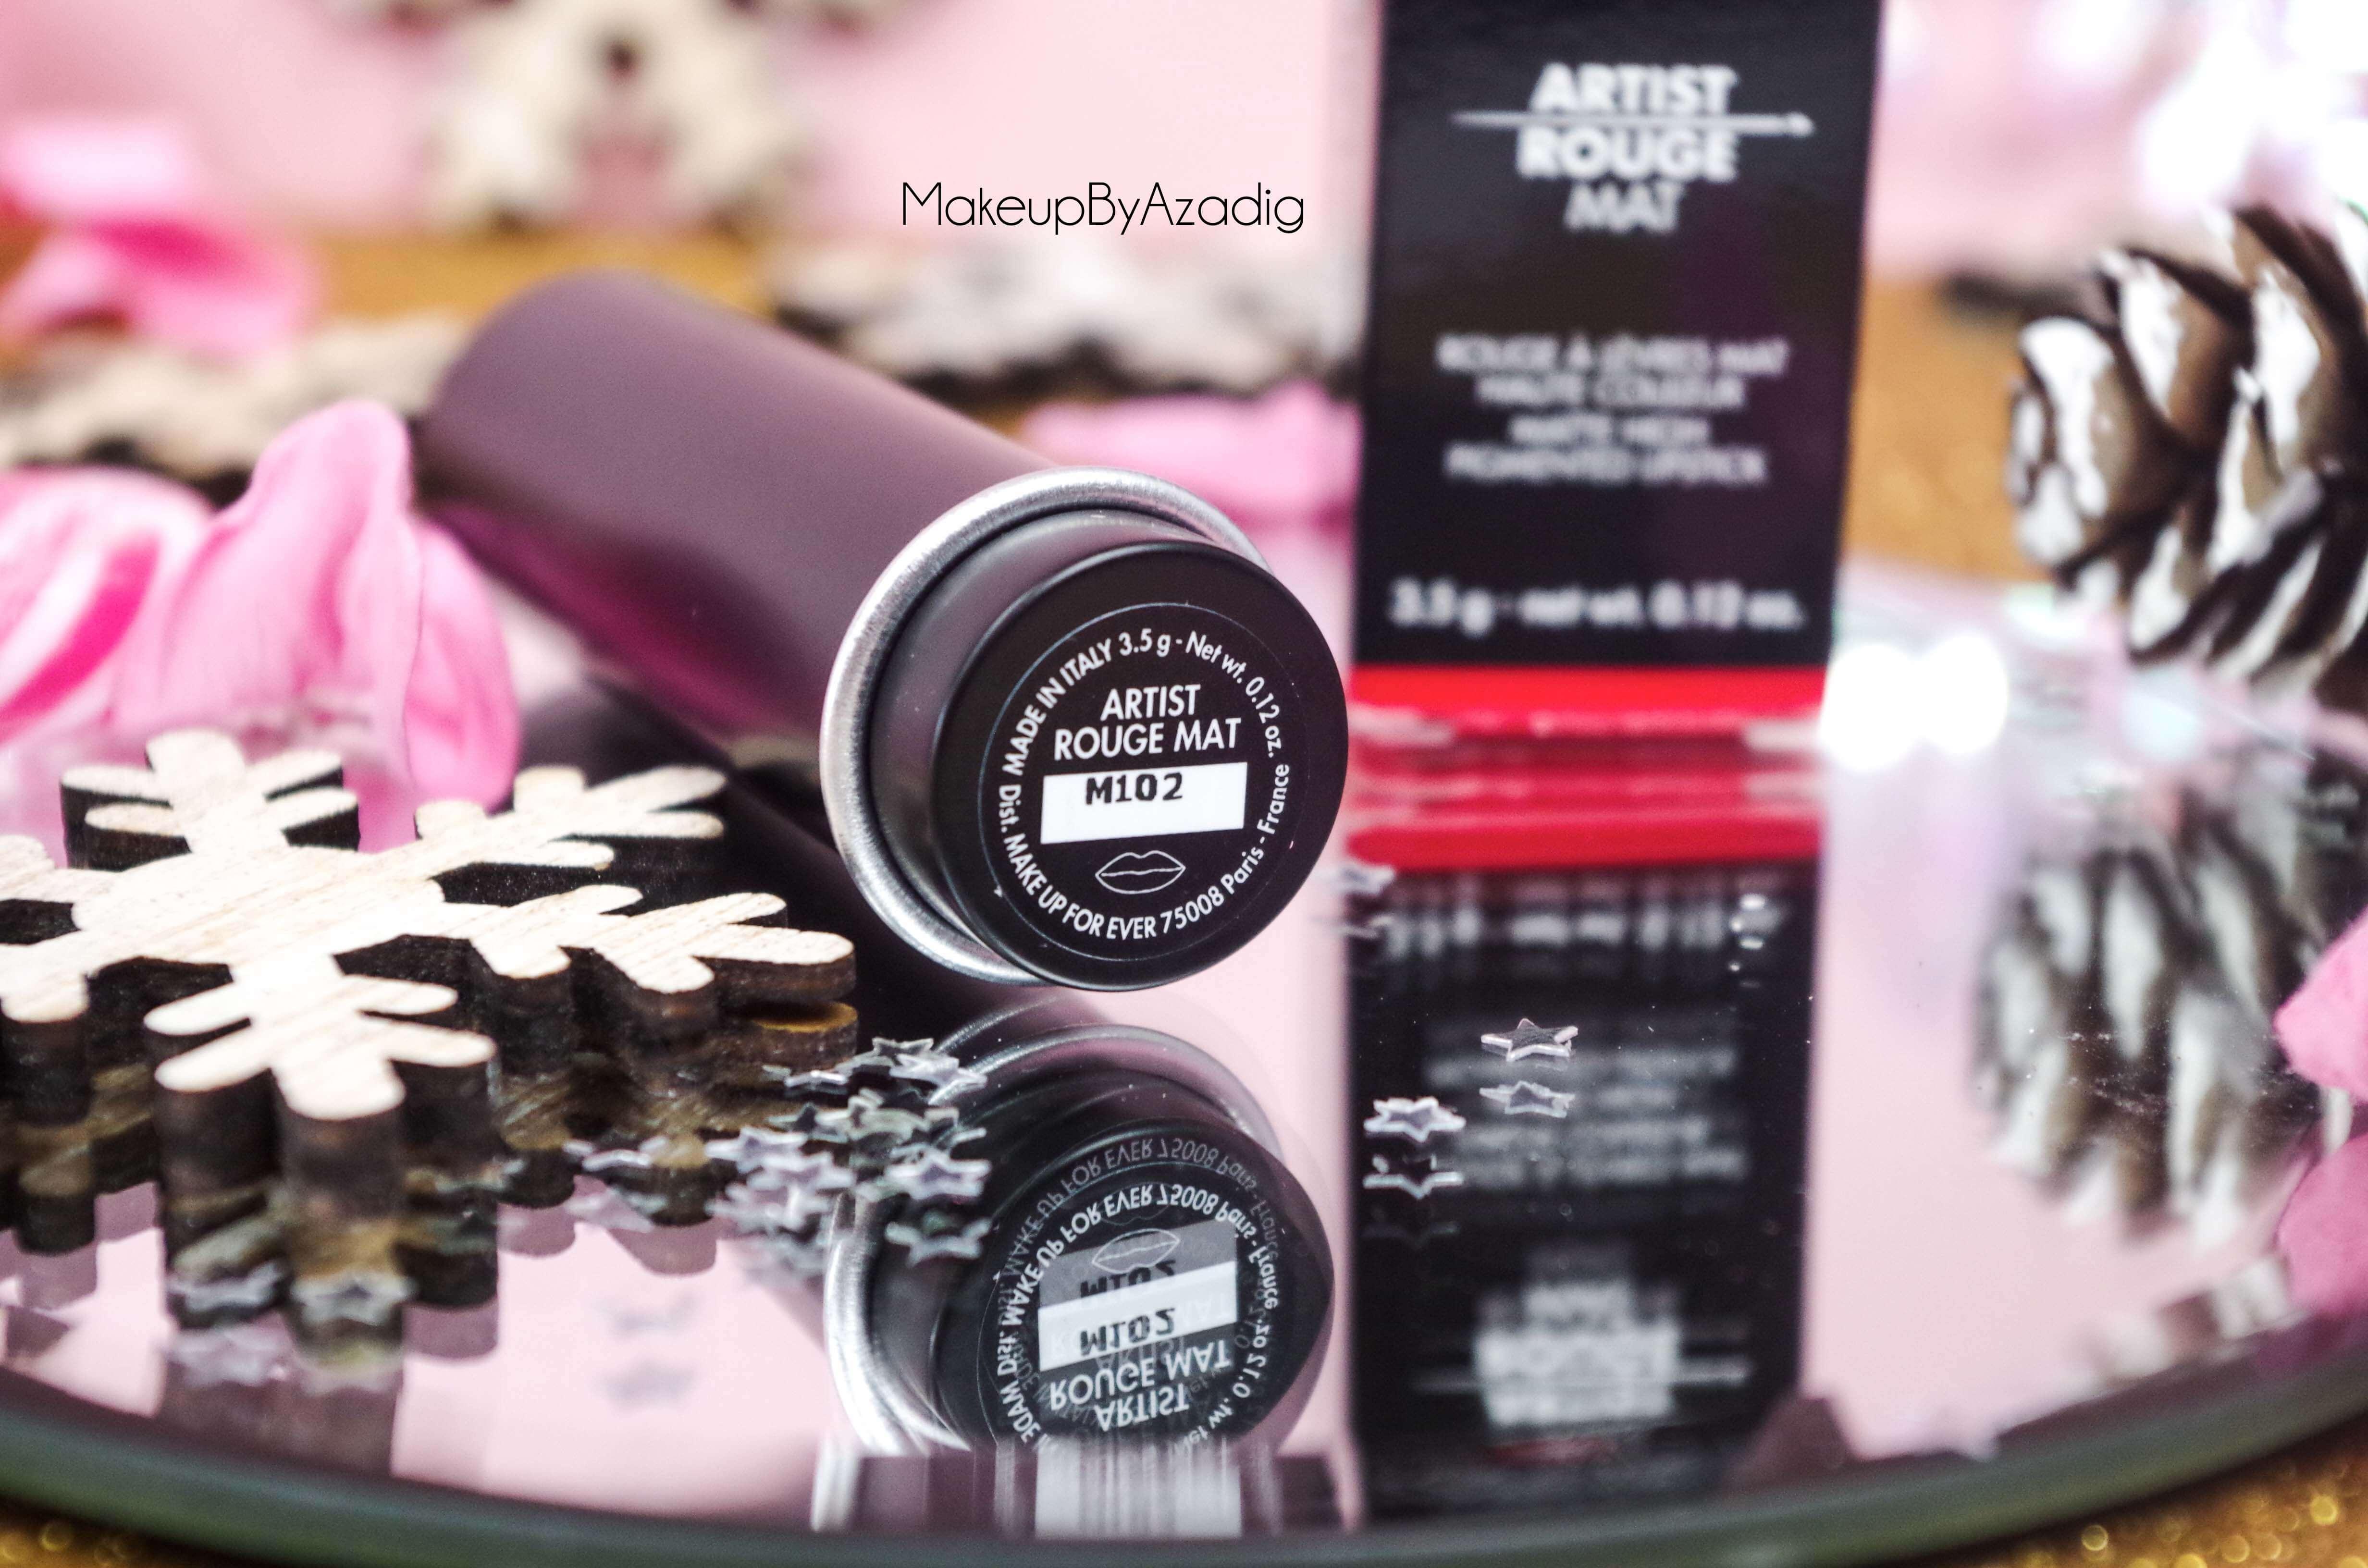 revue-artist-rouge-makeup-for-ever-rouge-levres-mat-sephora-prix-avis-review-m102-makeupbyazadig-italy